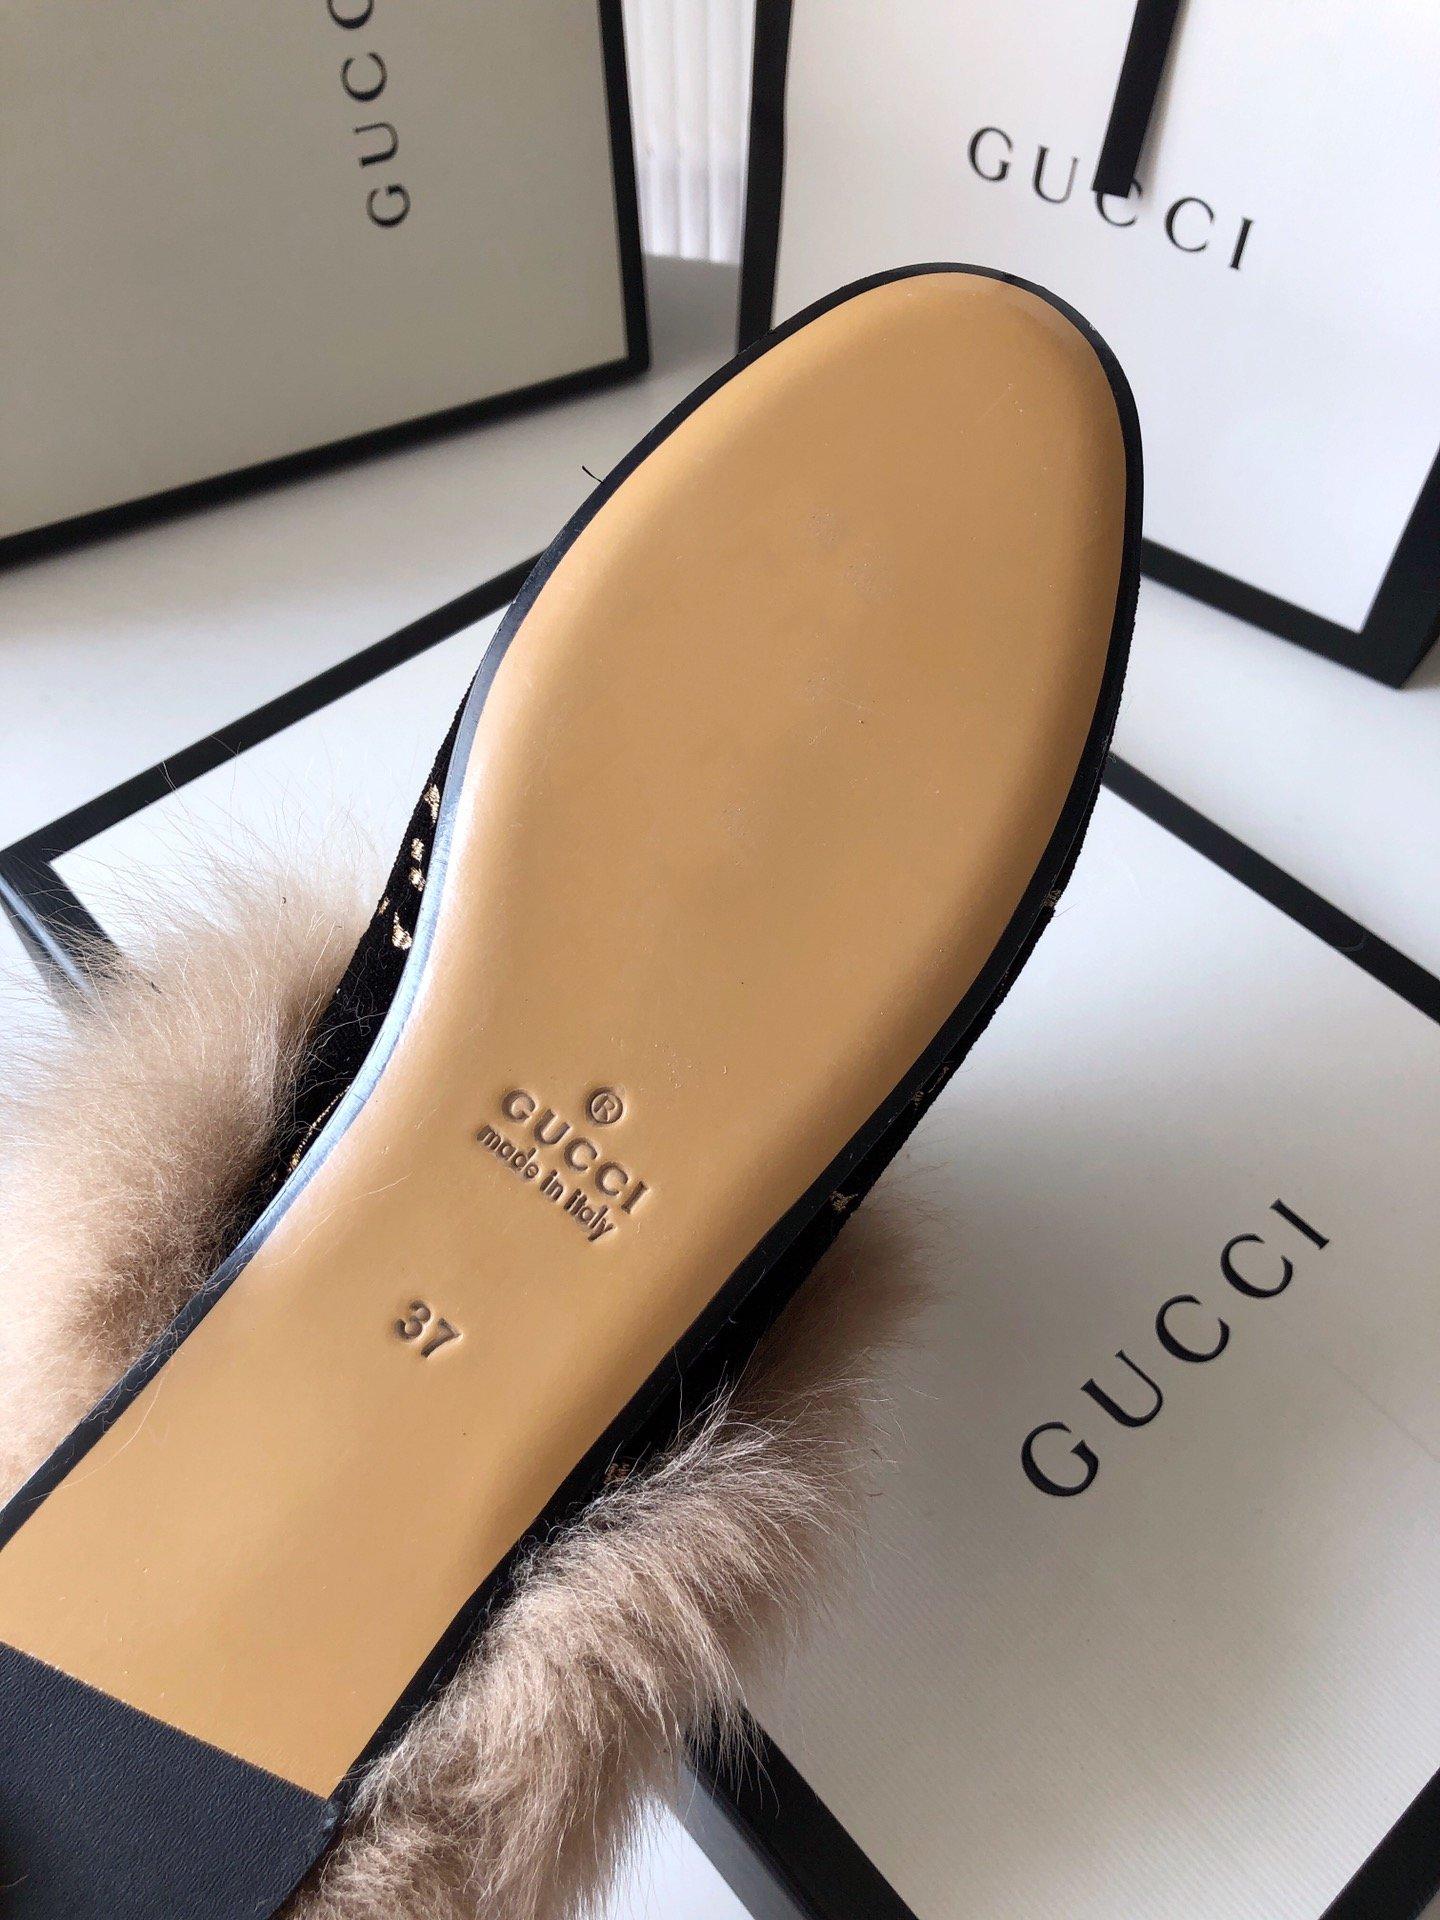 Gucci古奇 羔羊毛穆勒鞋双GG绣明星同款(图12)